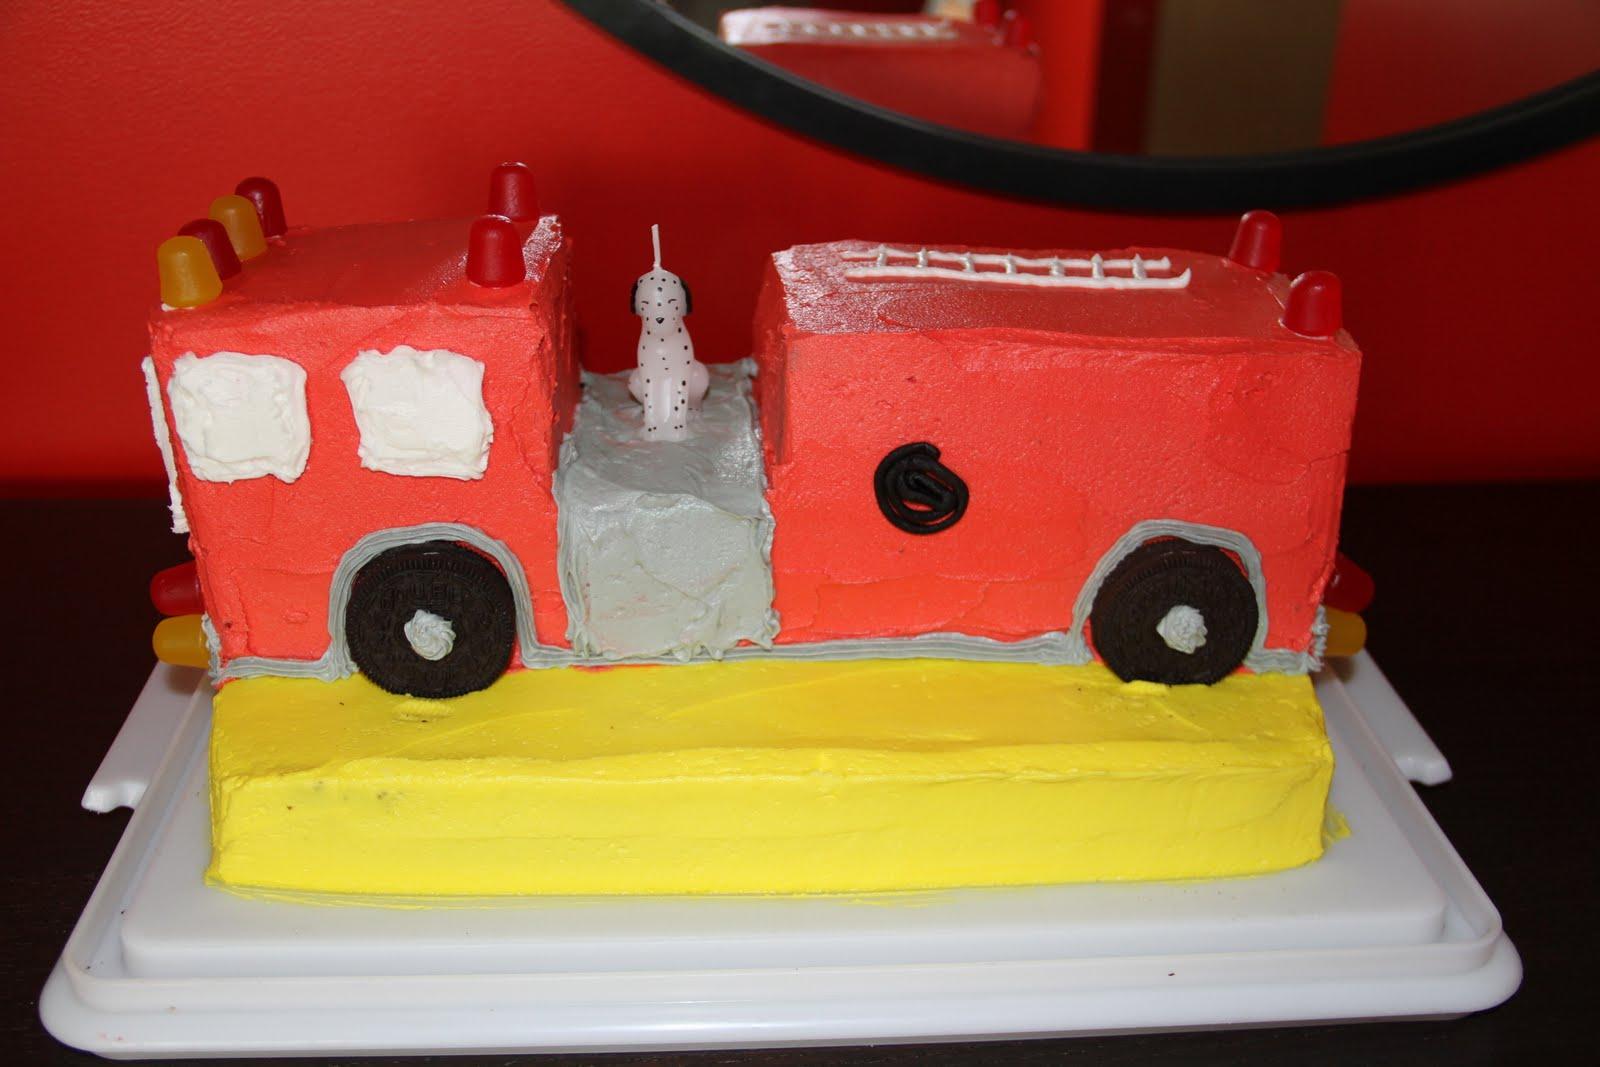 Birthday Cake Was Also Wonderful Enough To Make This One Thank You Tara Baking Goddess Betty Crocker Fire Engine Dalmatian Candle